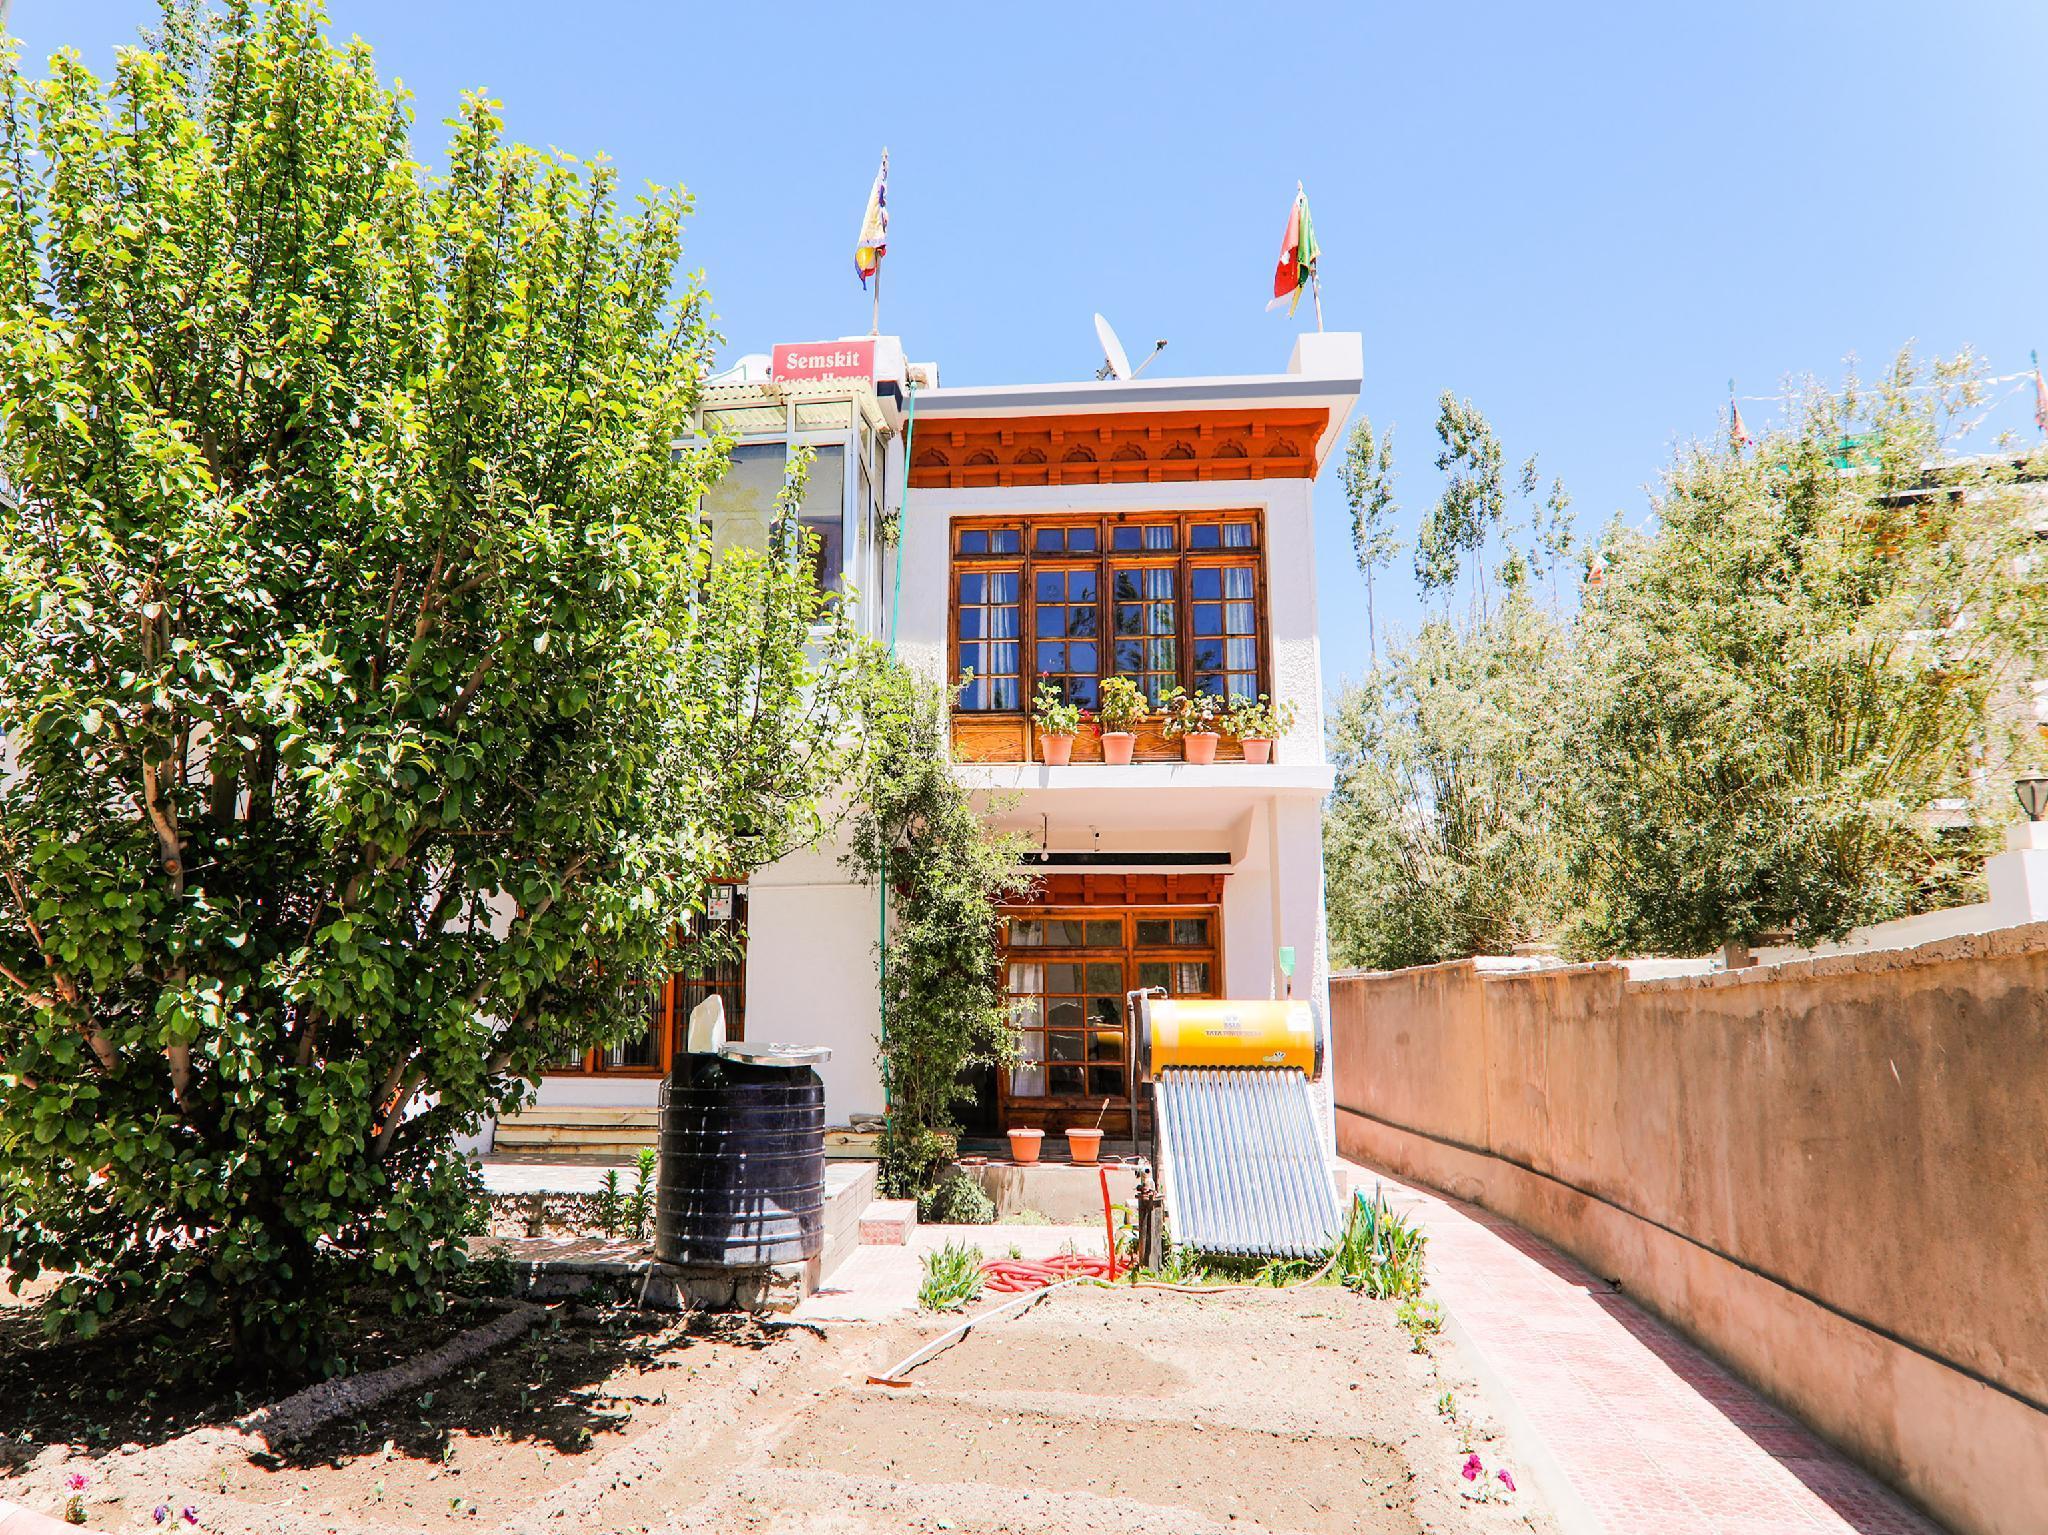 OYO 41662 Semskit Guest House, Leh (Ladakh)